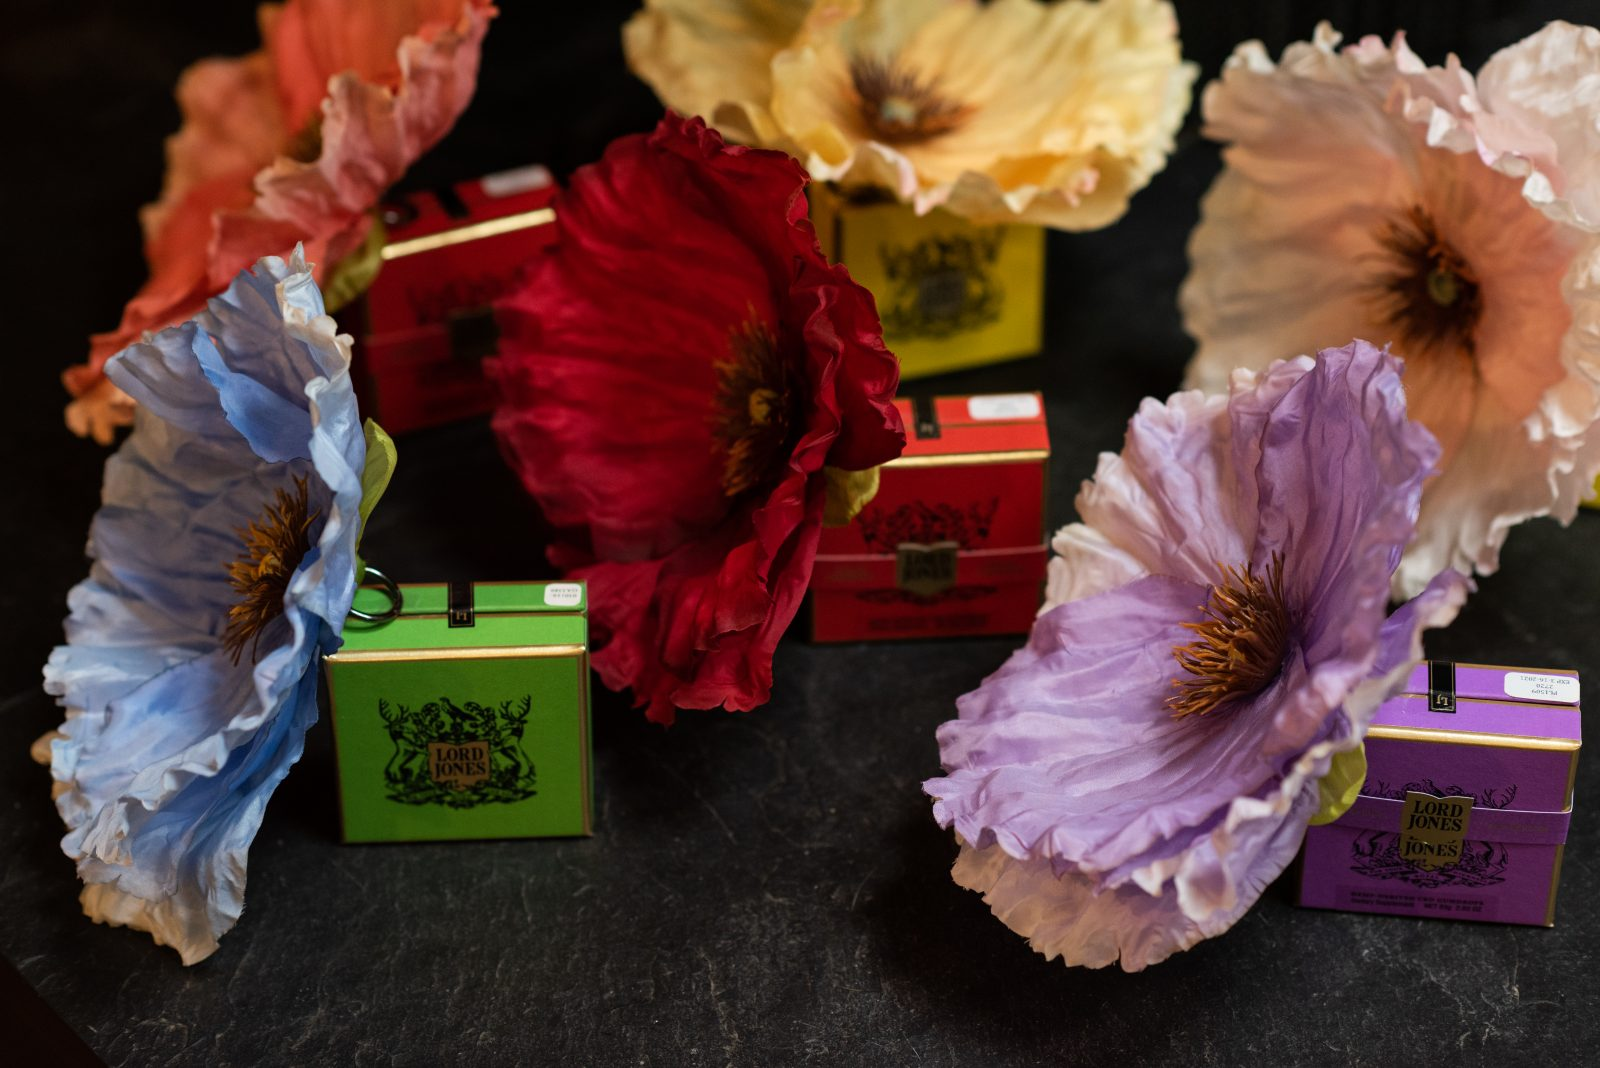 Flower party favors